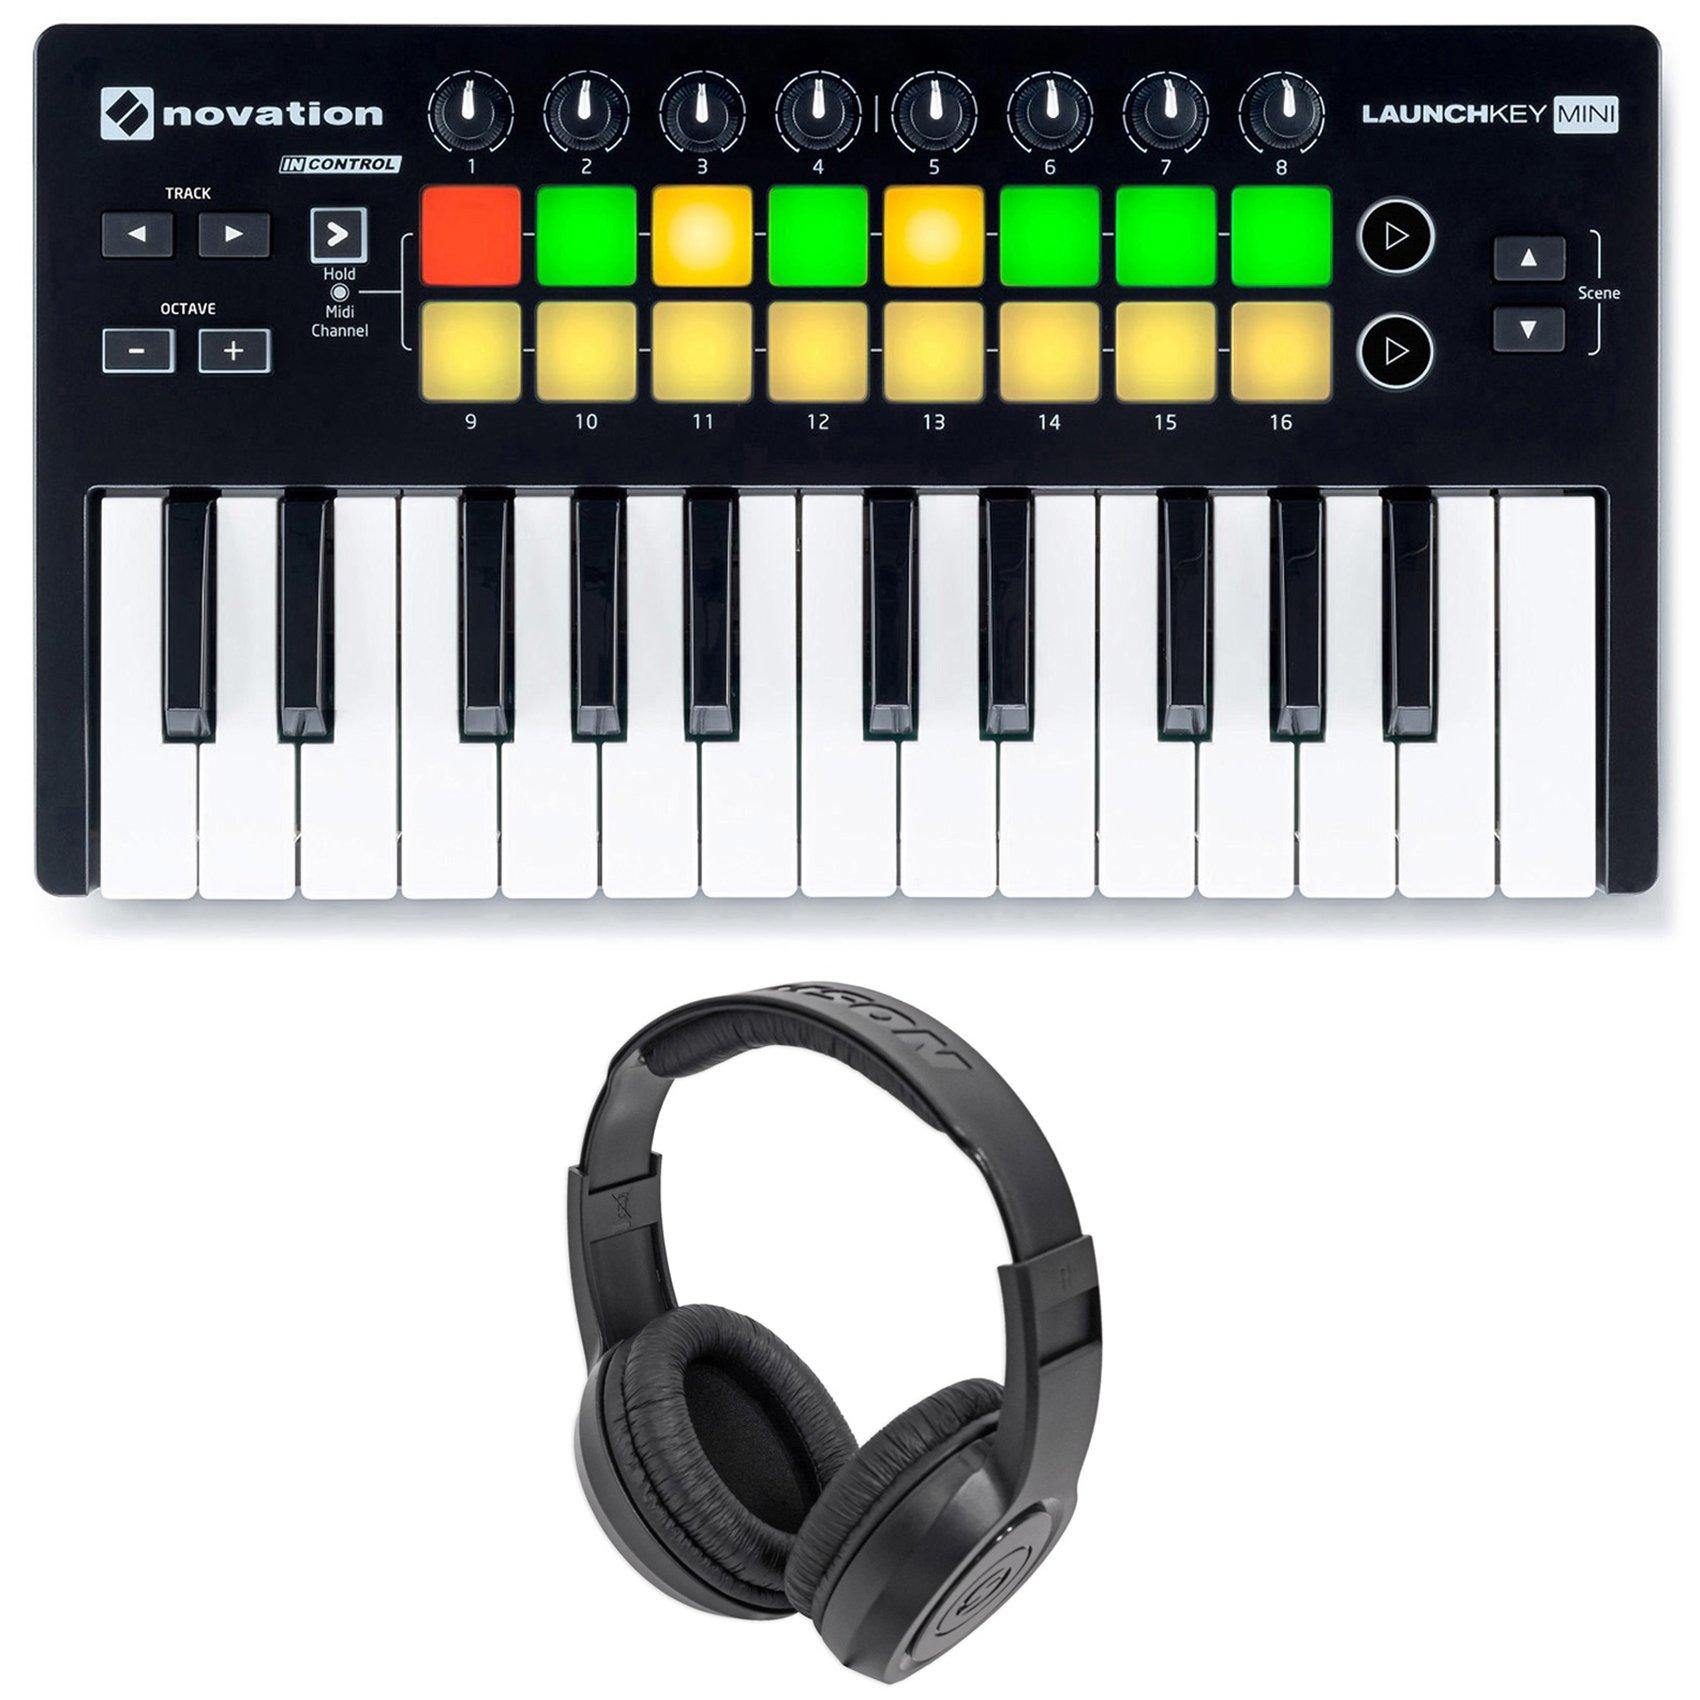 Novation LAUNCHKEY MINI MK2 25 Key USB Keyboard Controller+Headphones by Novation